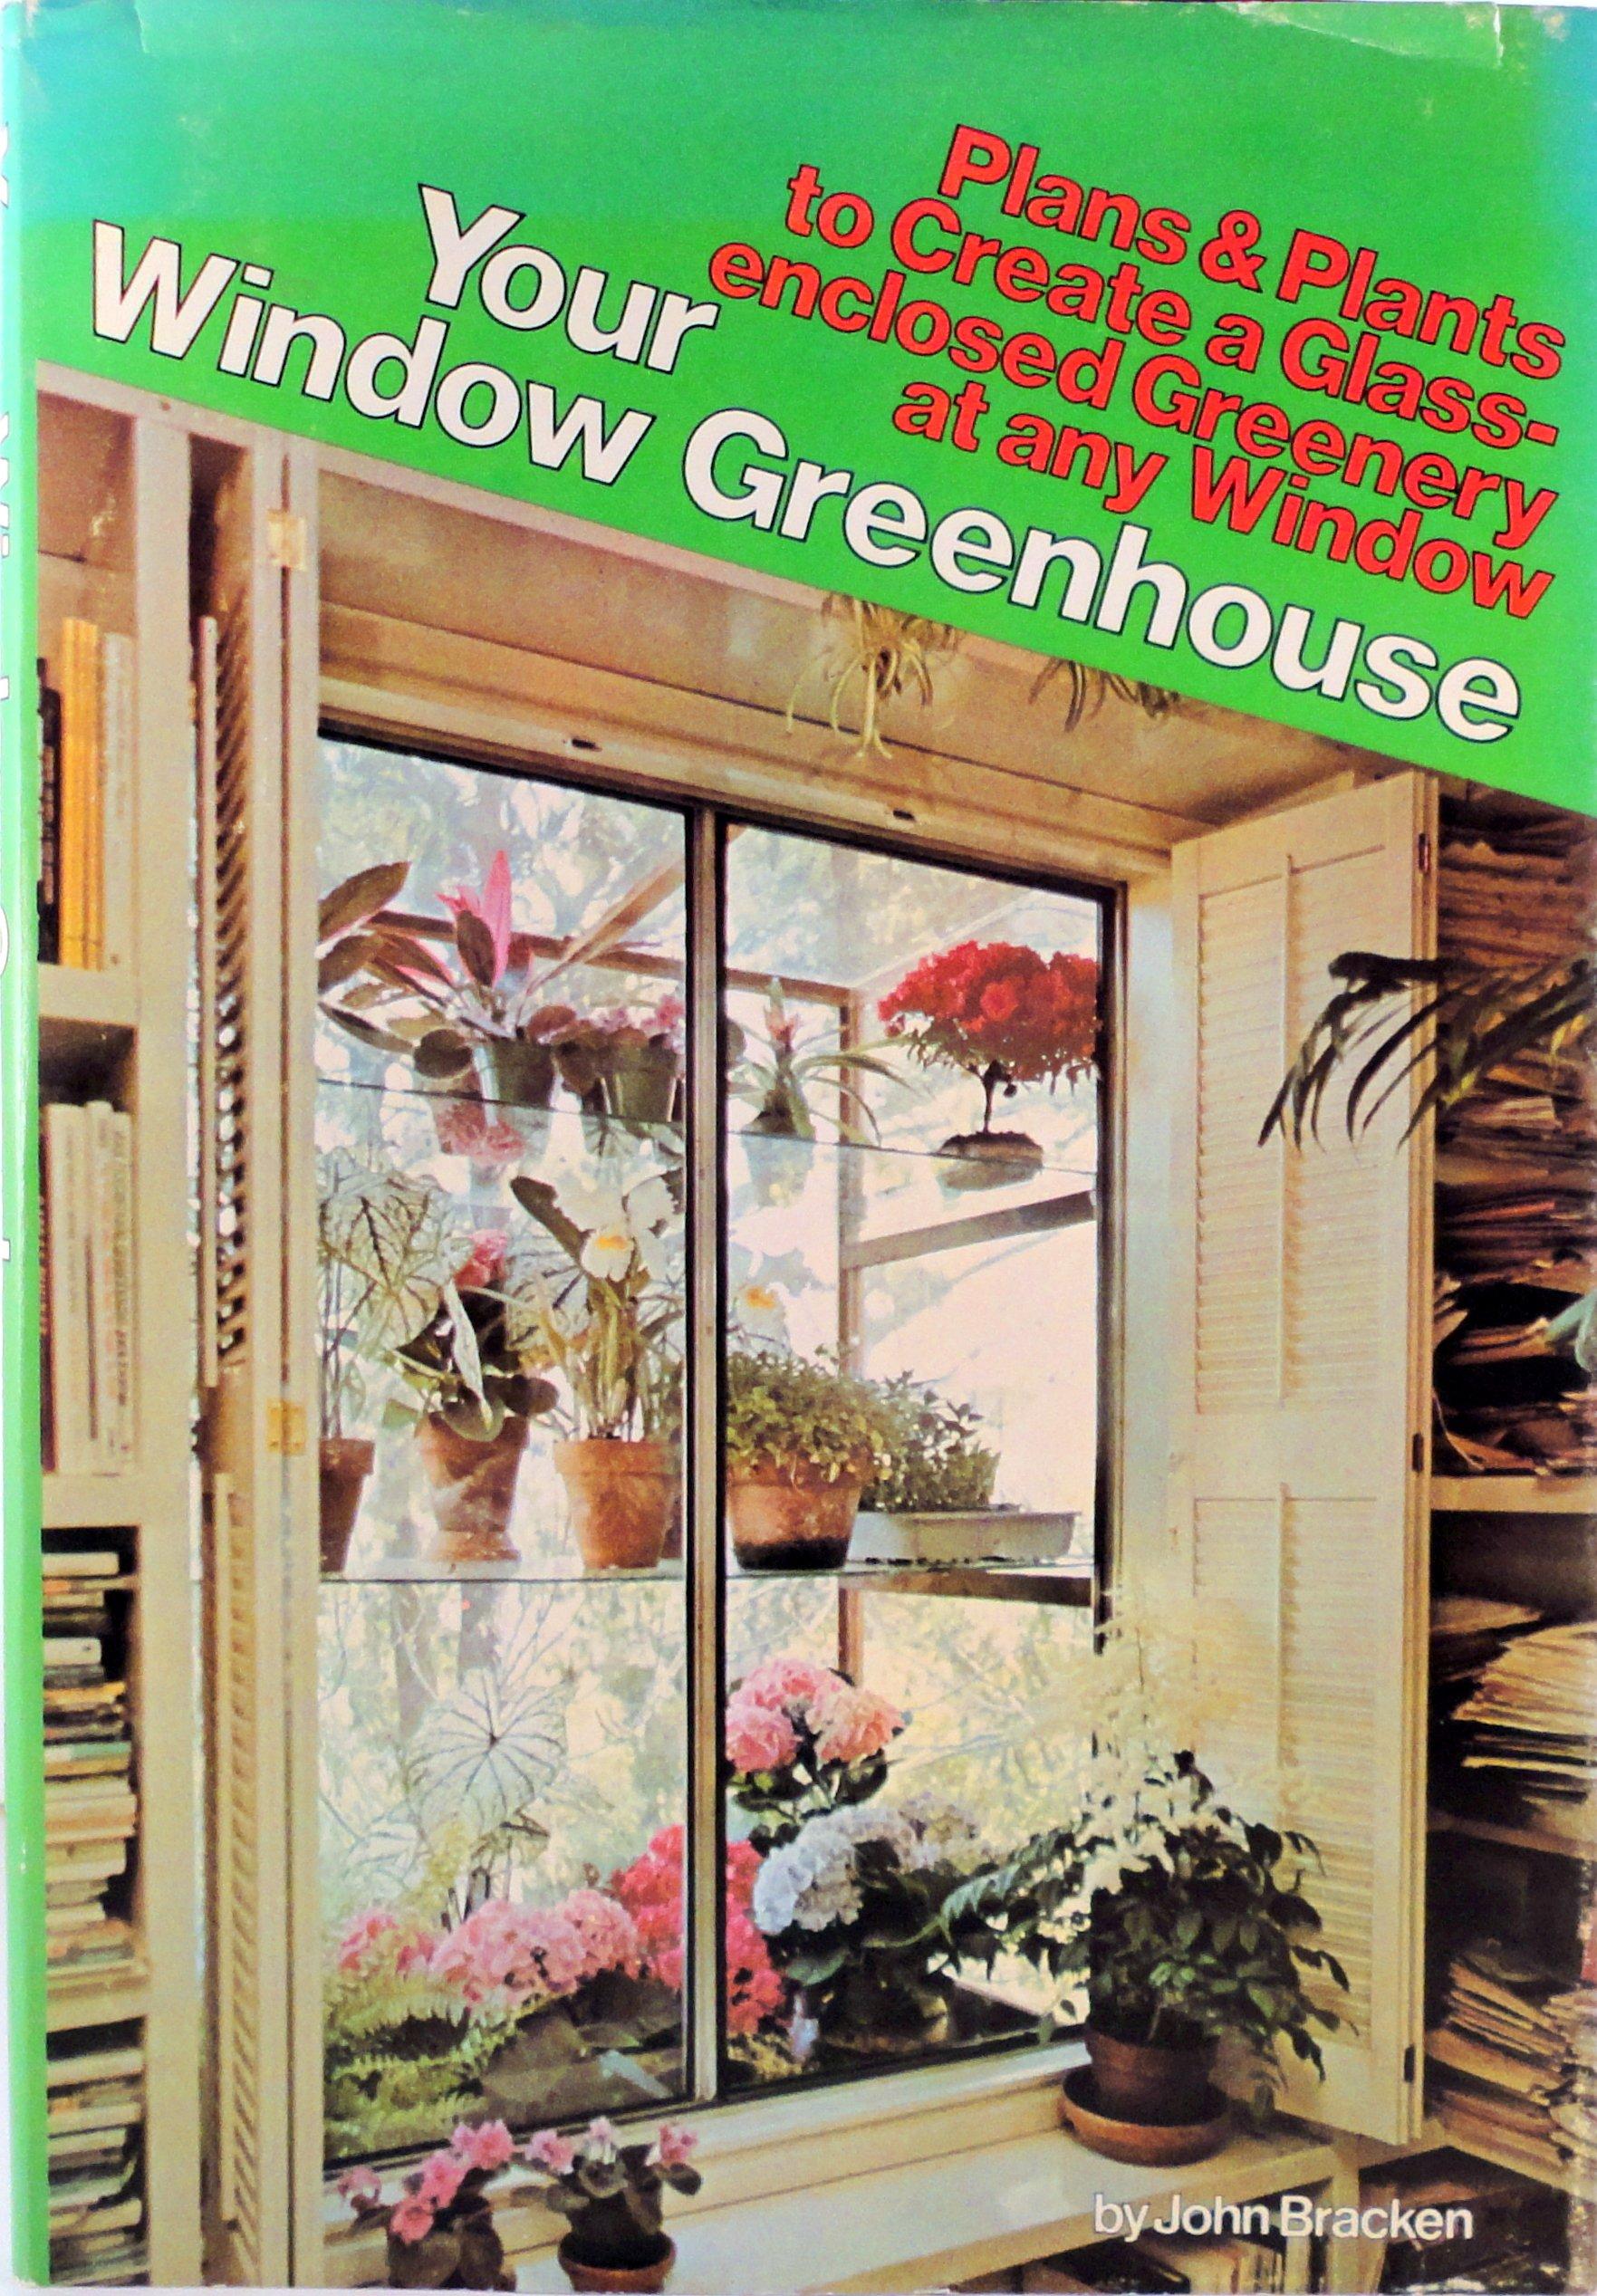 Your Window Greenhouse